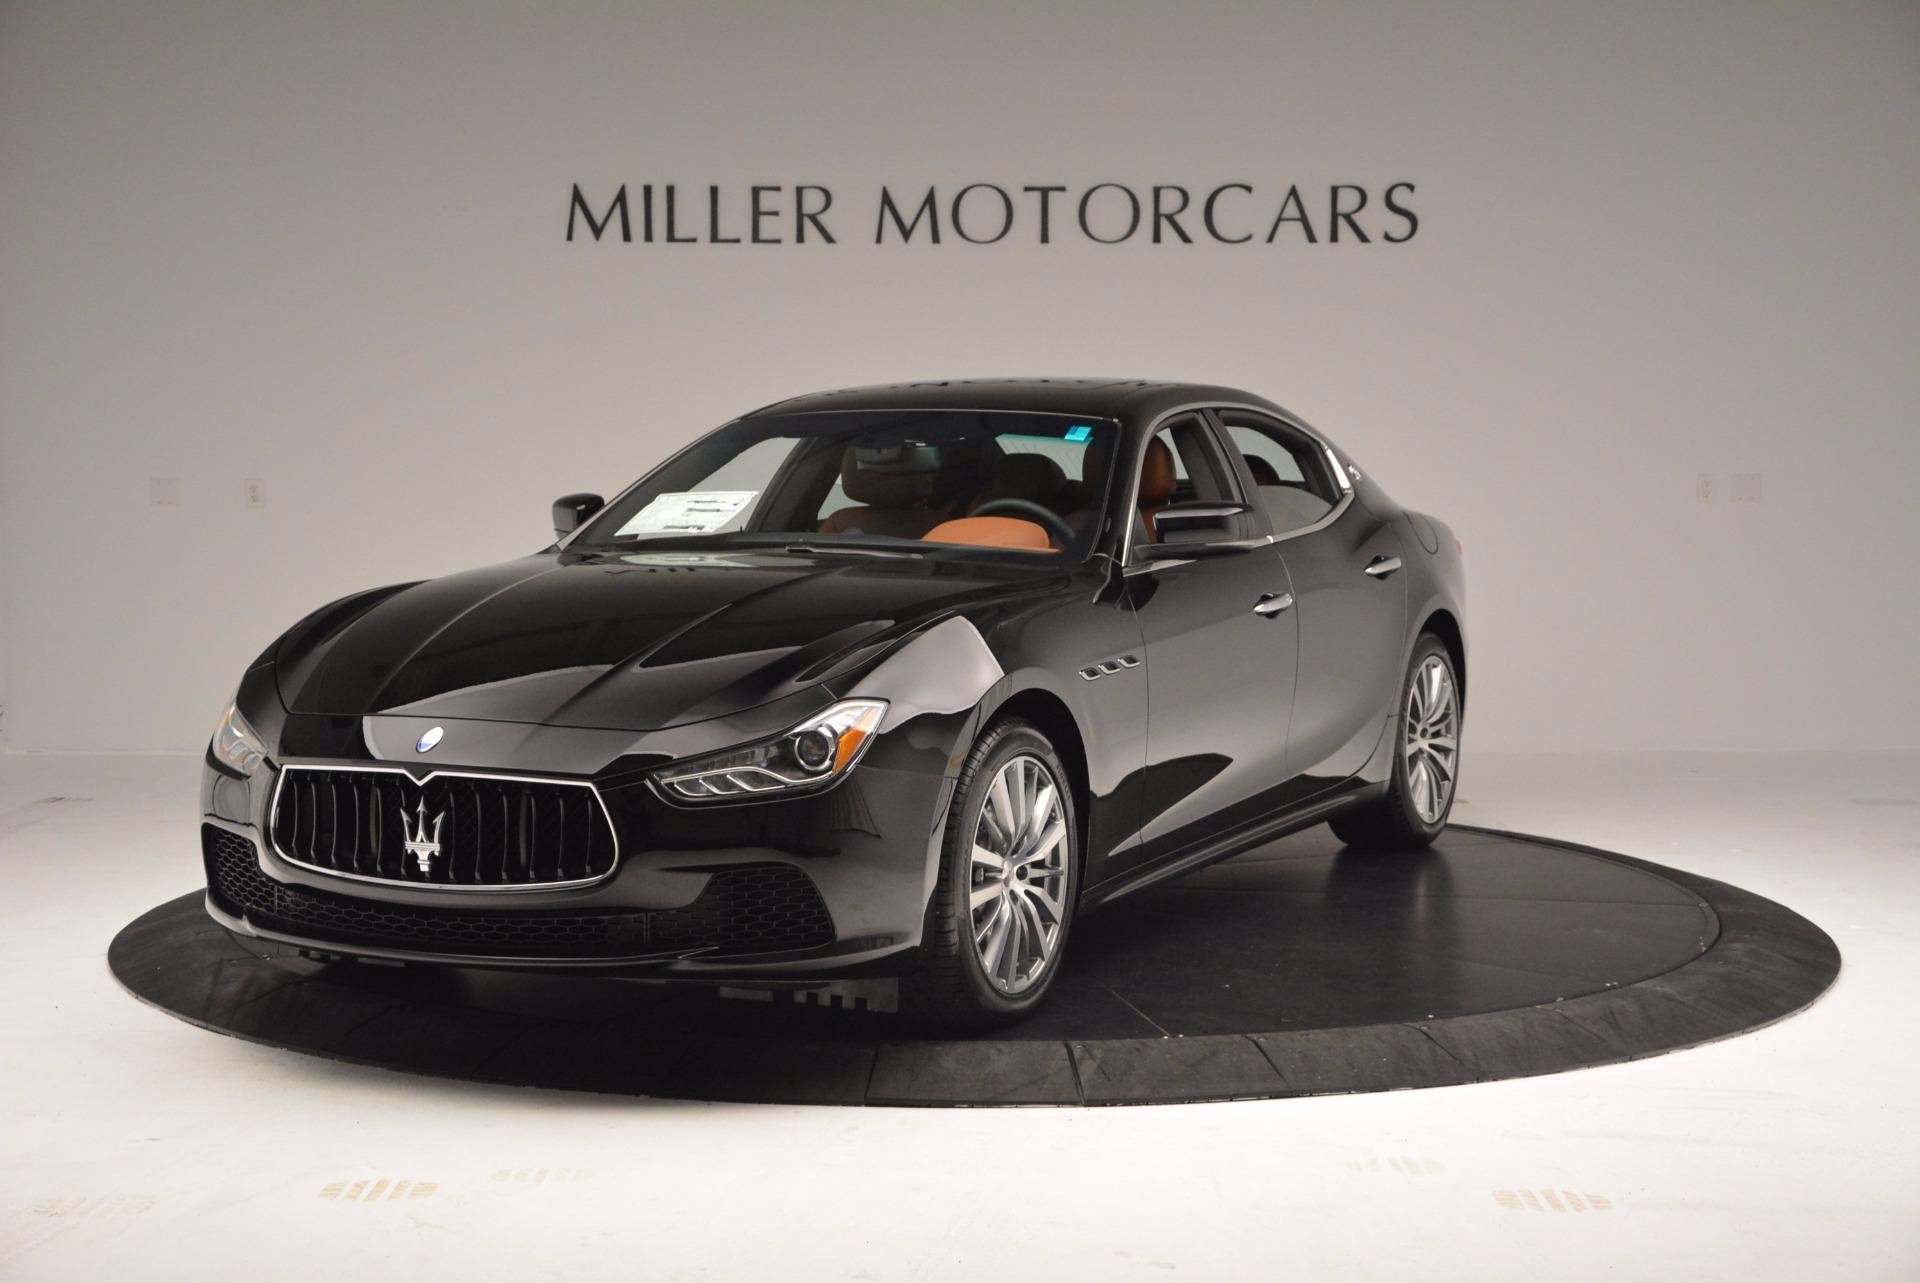 New 2017 Maserati Ghibli S Q4 EX-LOANER For Sale In Westport, CT 1115_main